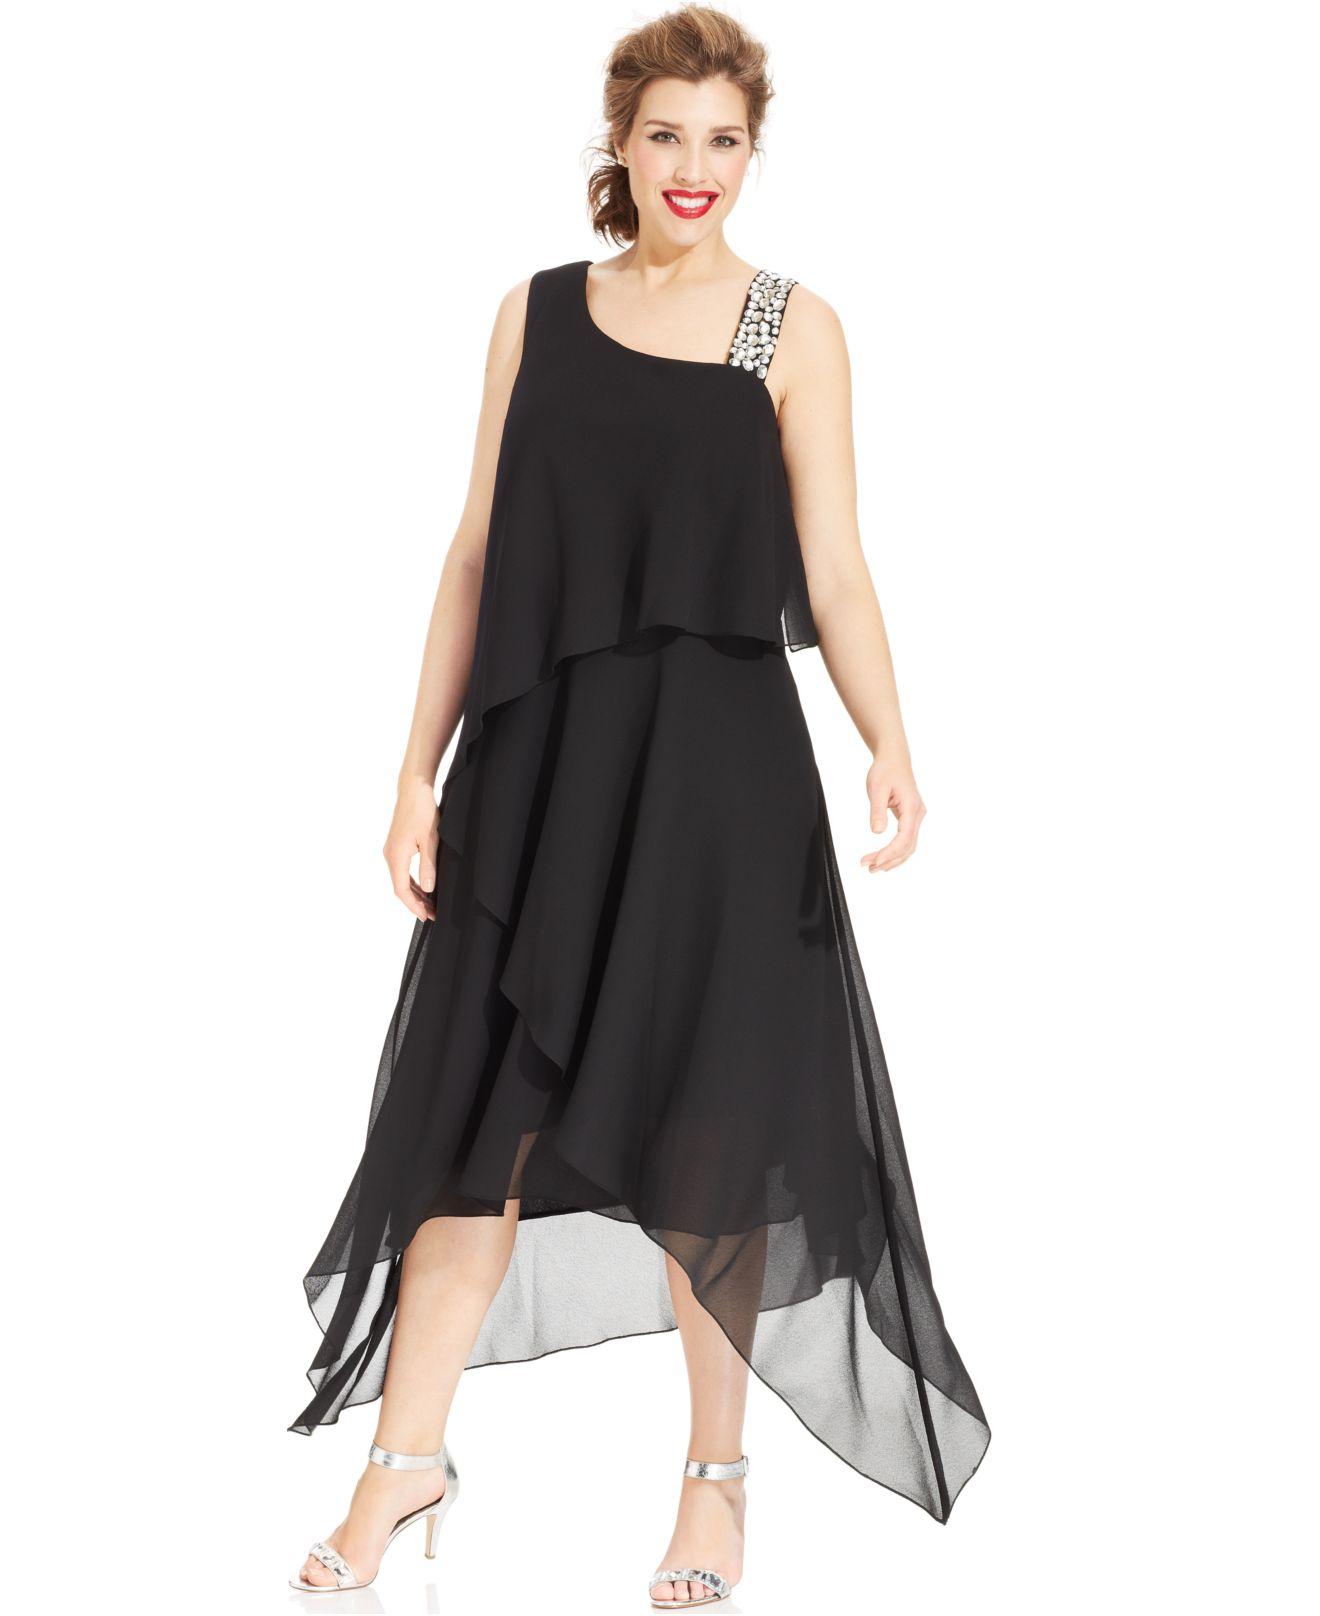 Alex Evenings Plus Size Asymmetrical Tiered Dress in Black - Lyst